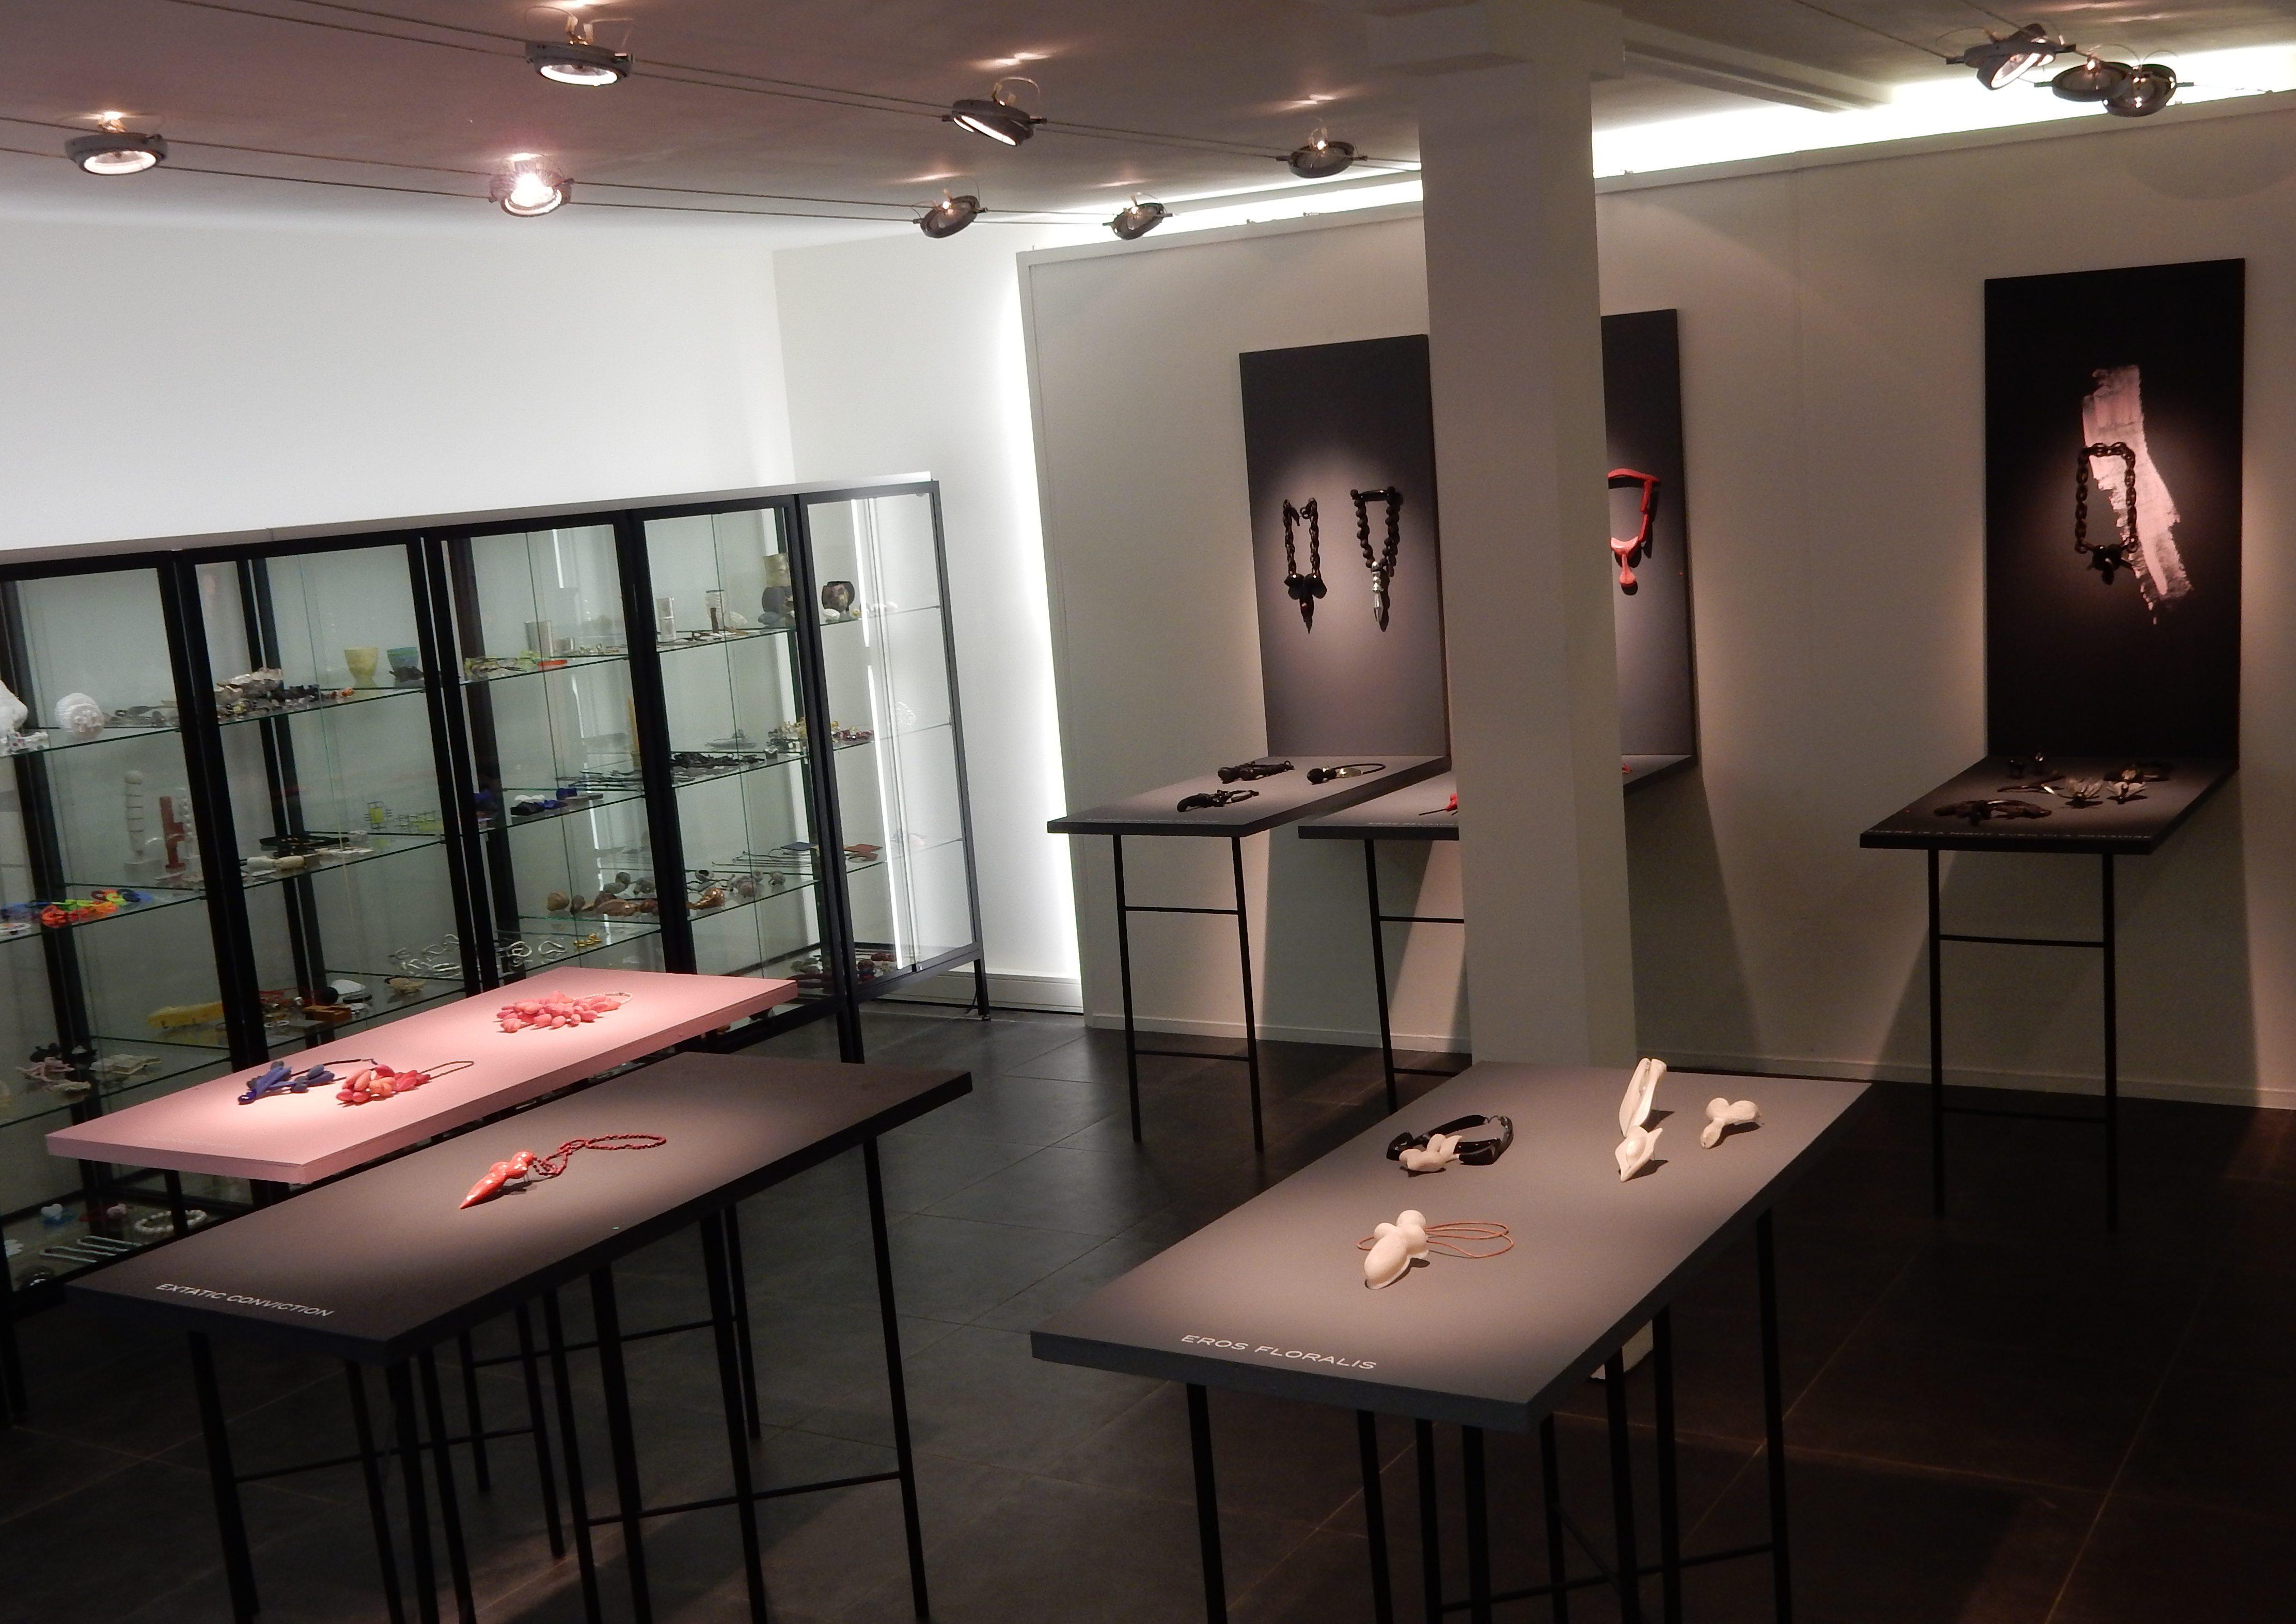 Tanel Veenre i Galerie Ra. Foto Esther Doornbusch, 10 november 2018, CC BY 4.0